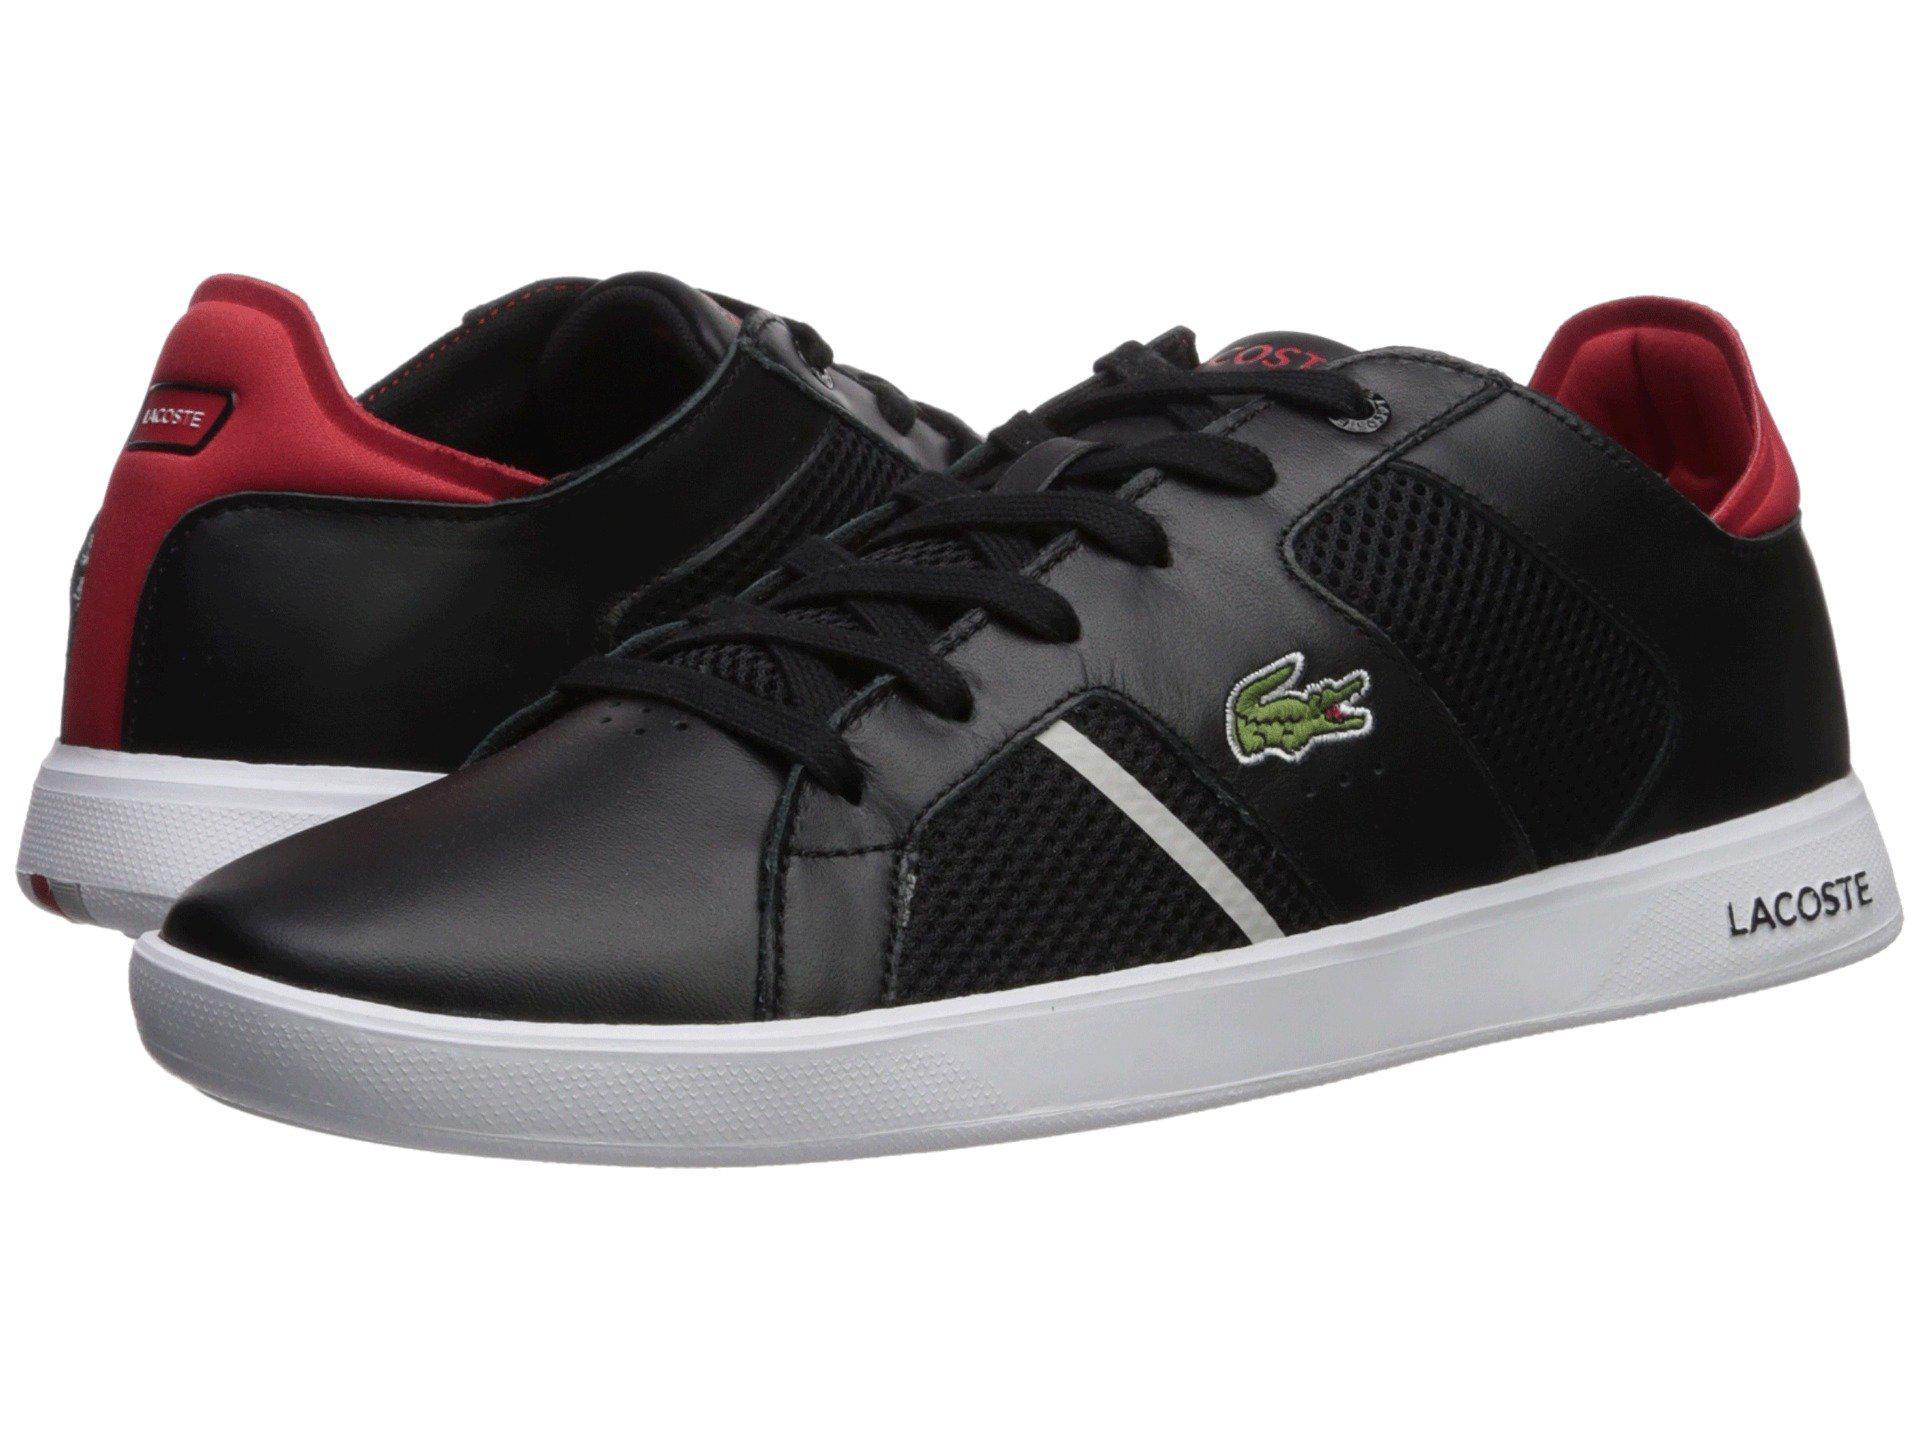 d9275178d Lacoste - Black Novas Ct 218 1 (dark Grey white) Men s Shoes for. View  fullscreen